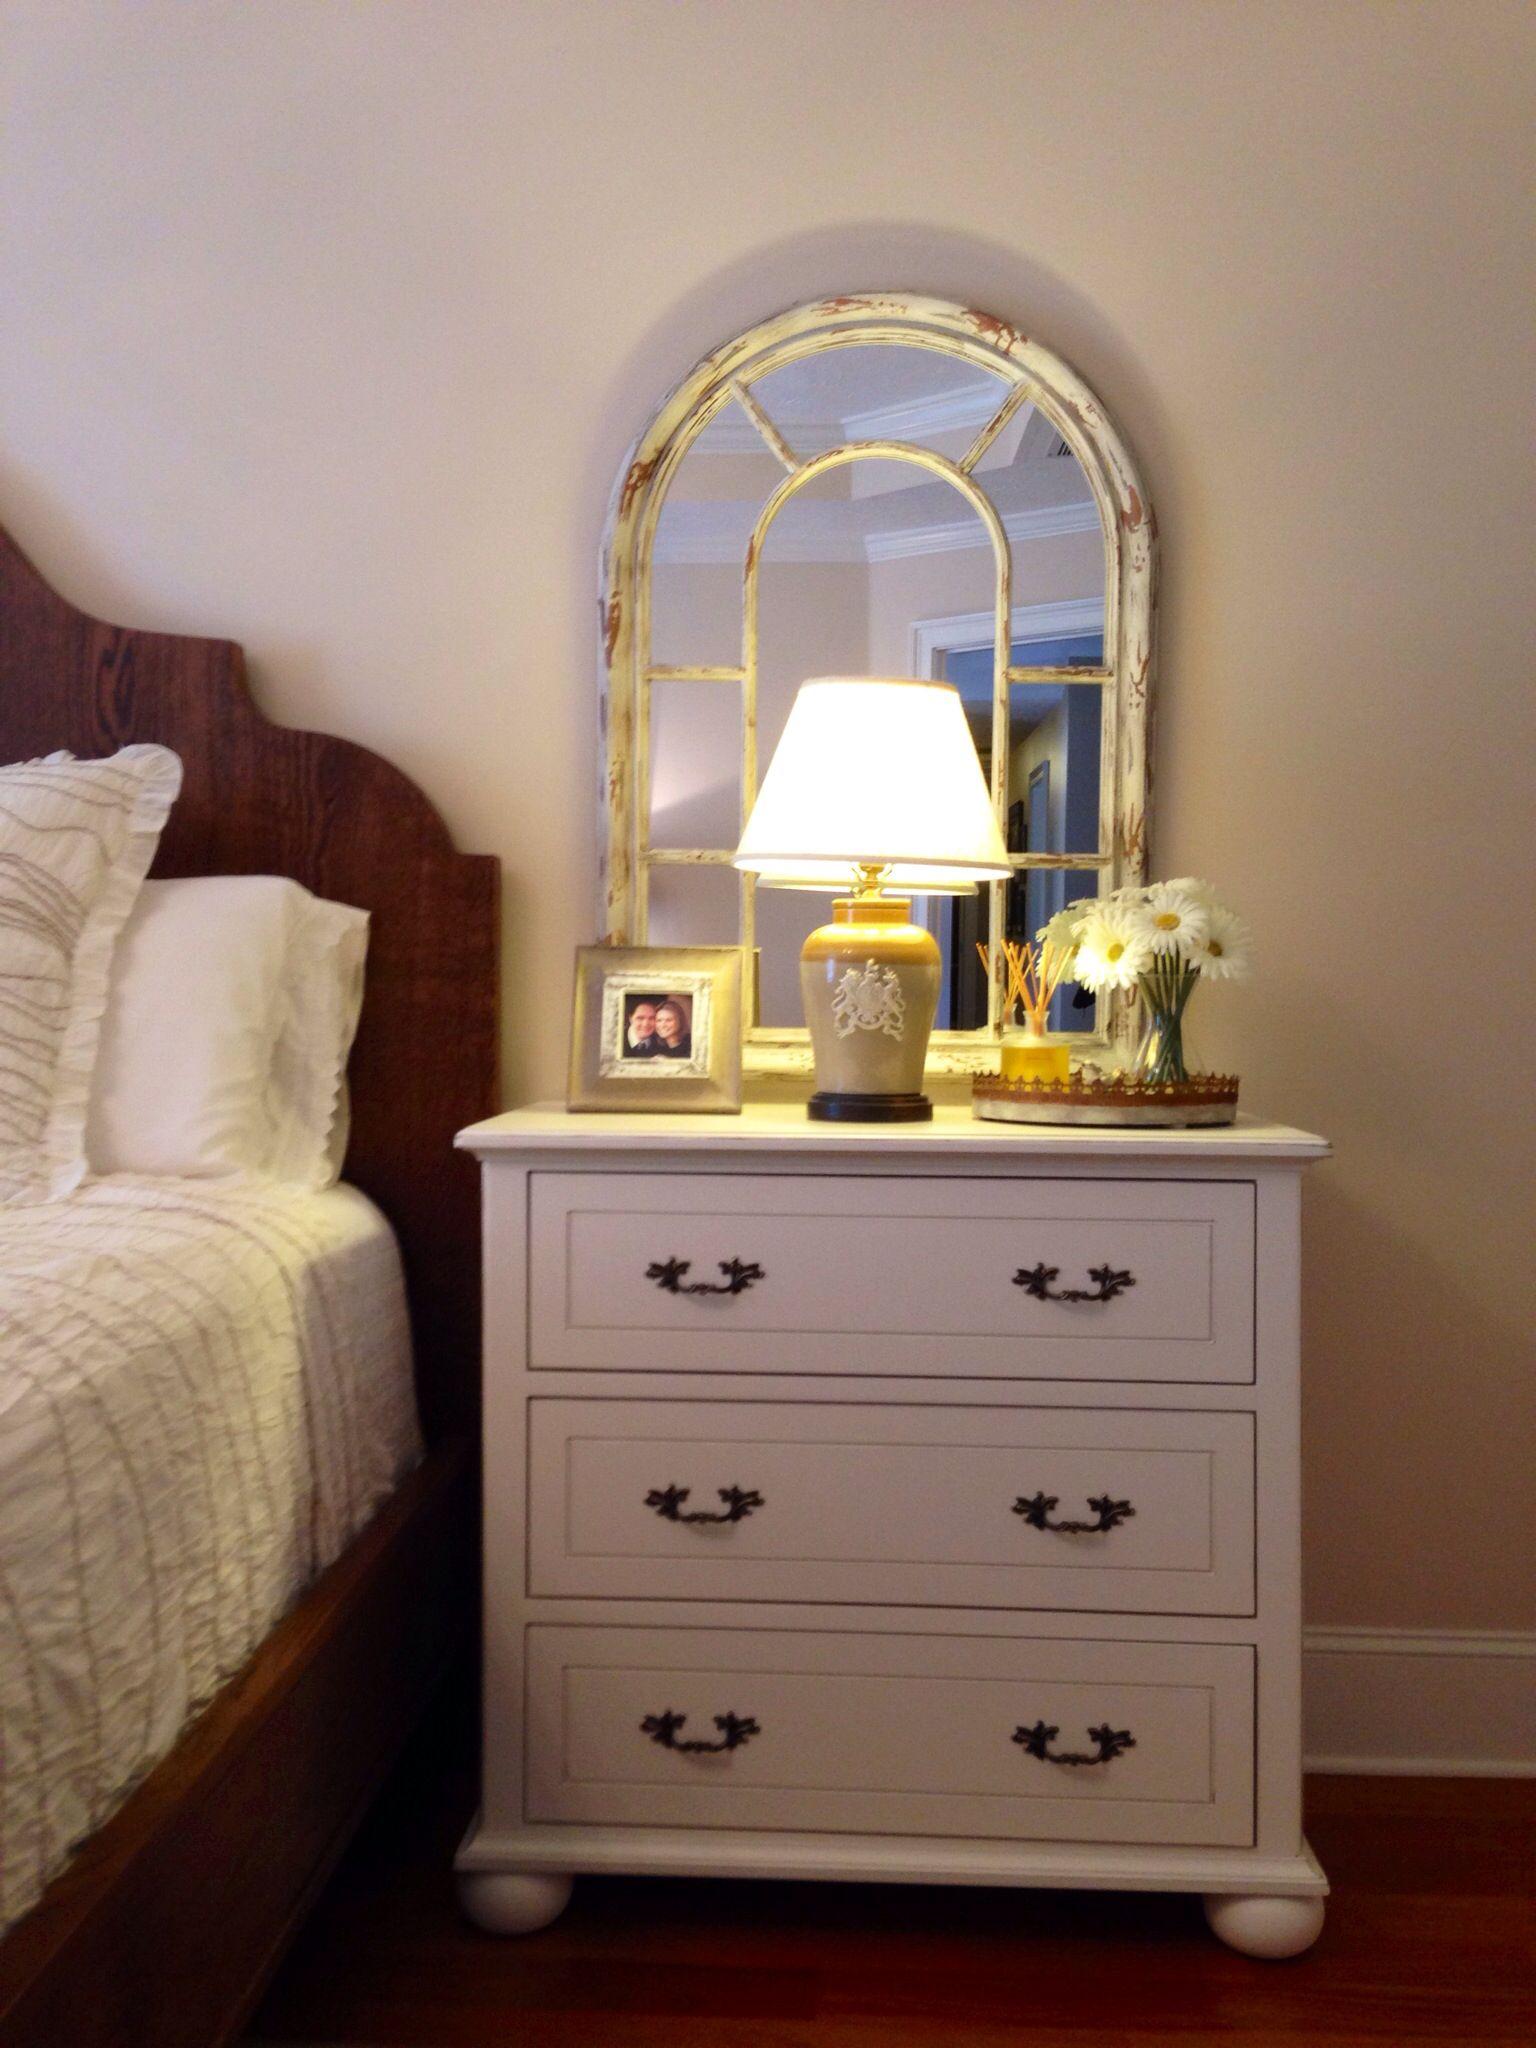 Bedside table decor pinterest - Nightstand Decor